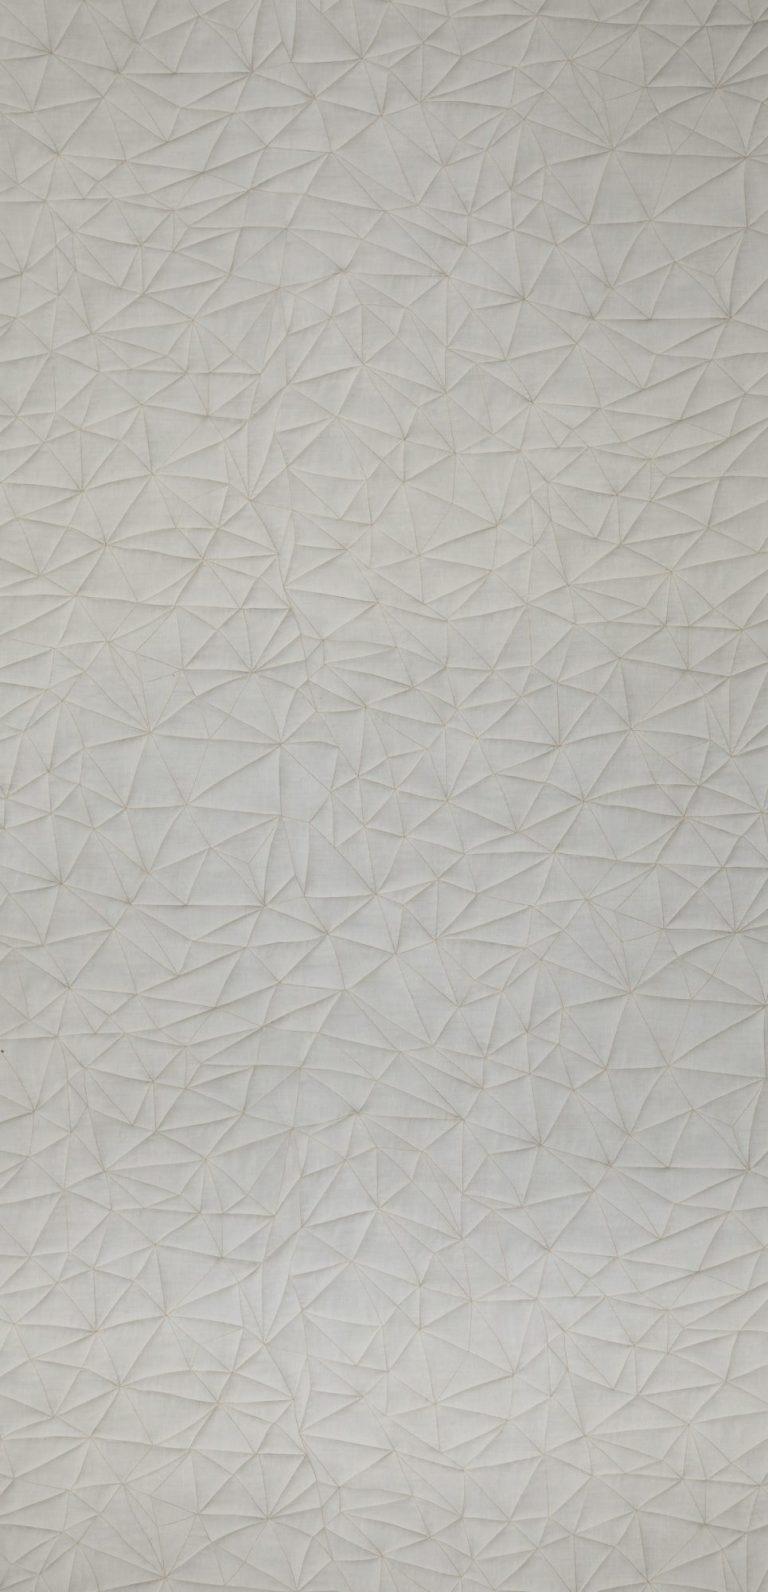 HPL Specials - White Linen